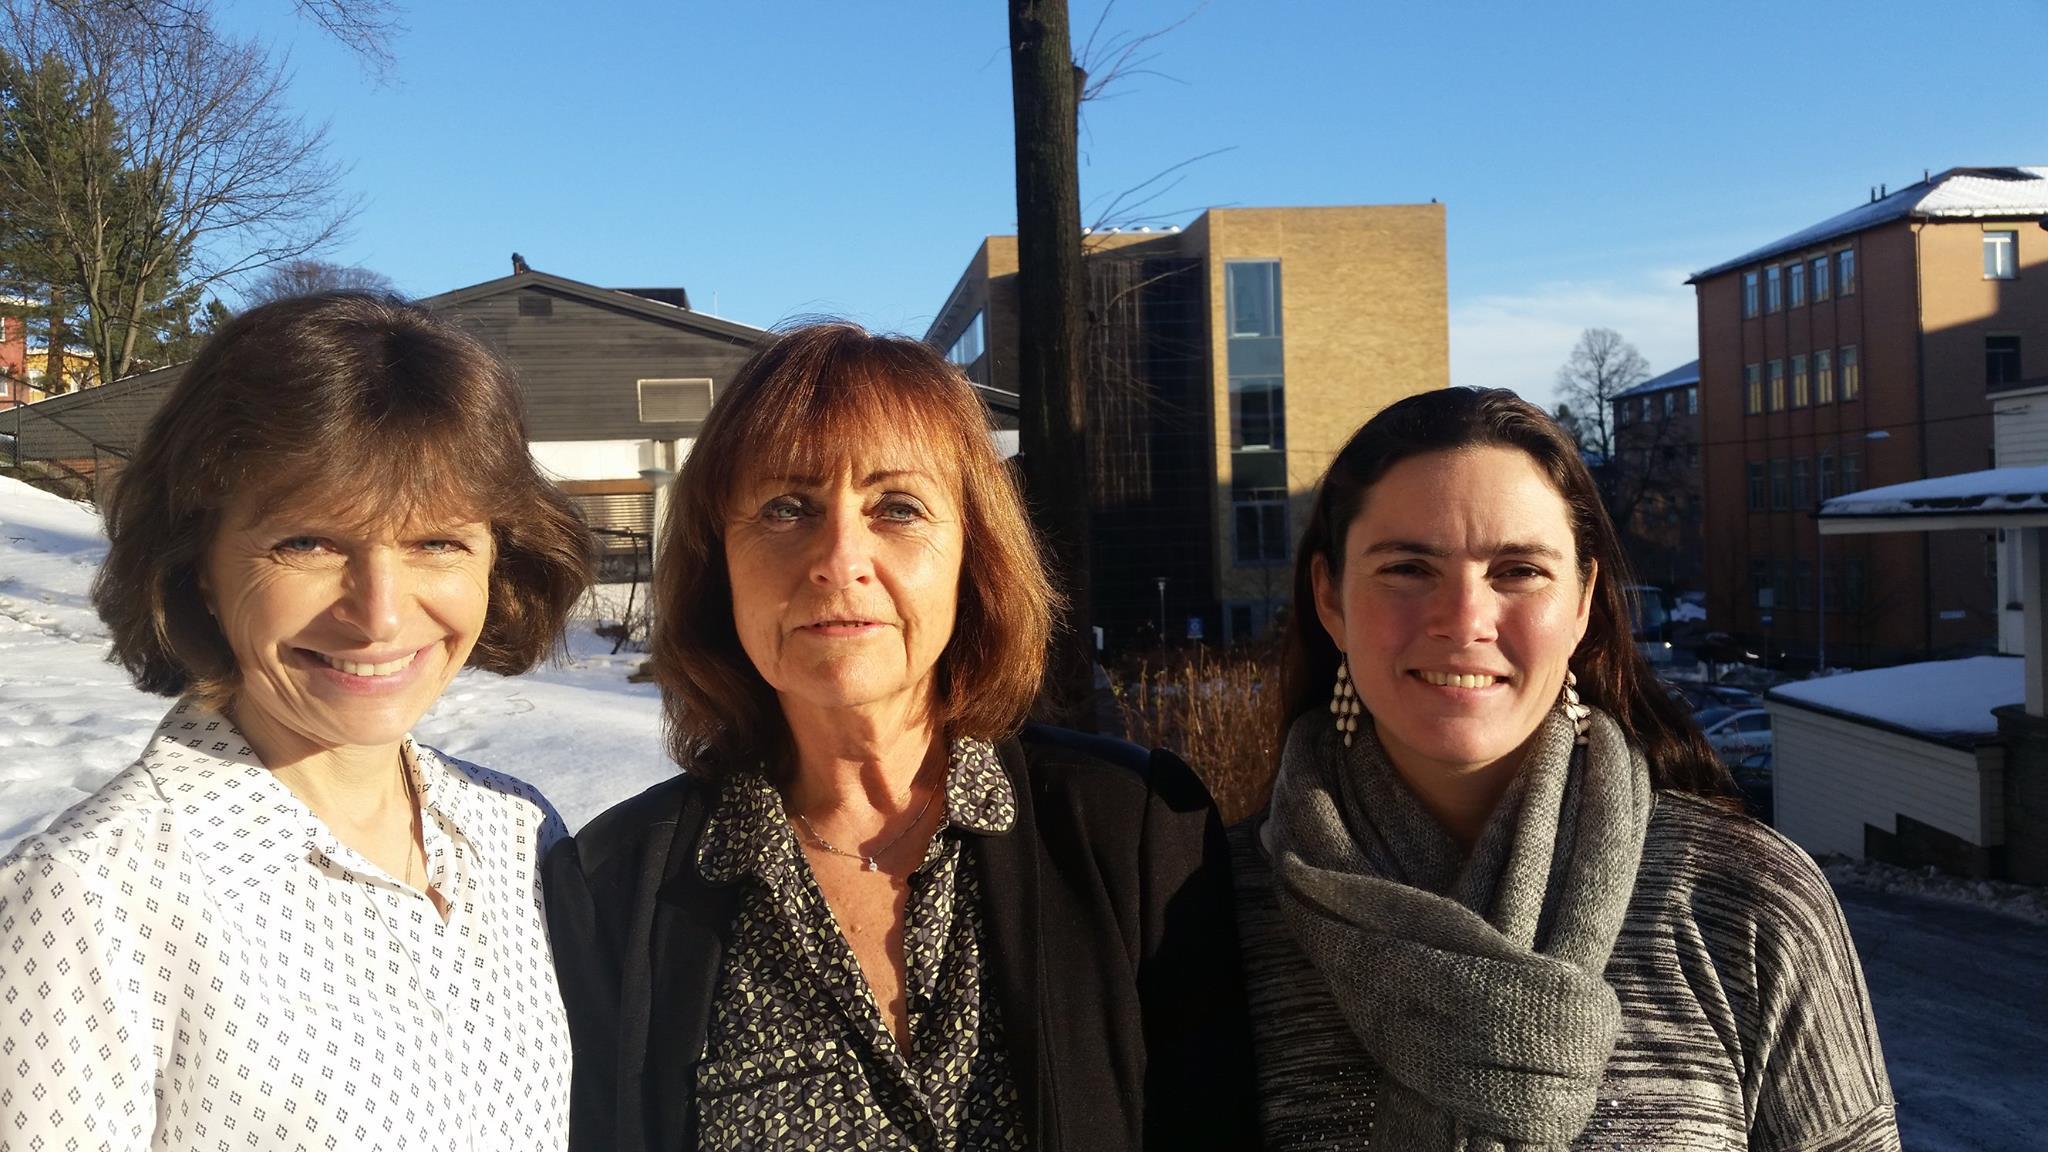 Vi skaldrive AktivA-programmet fremover!Fra venstre, forskerneMay Arna Risberg, Inger Holm og Anne Therese Tveter. Følg oss gjerne på egen  Facebook-side.                                 www.forskerlivet.no